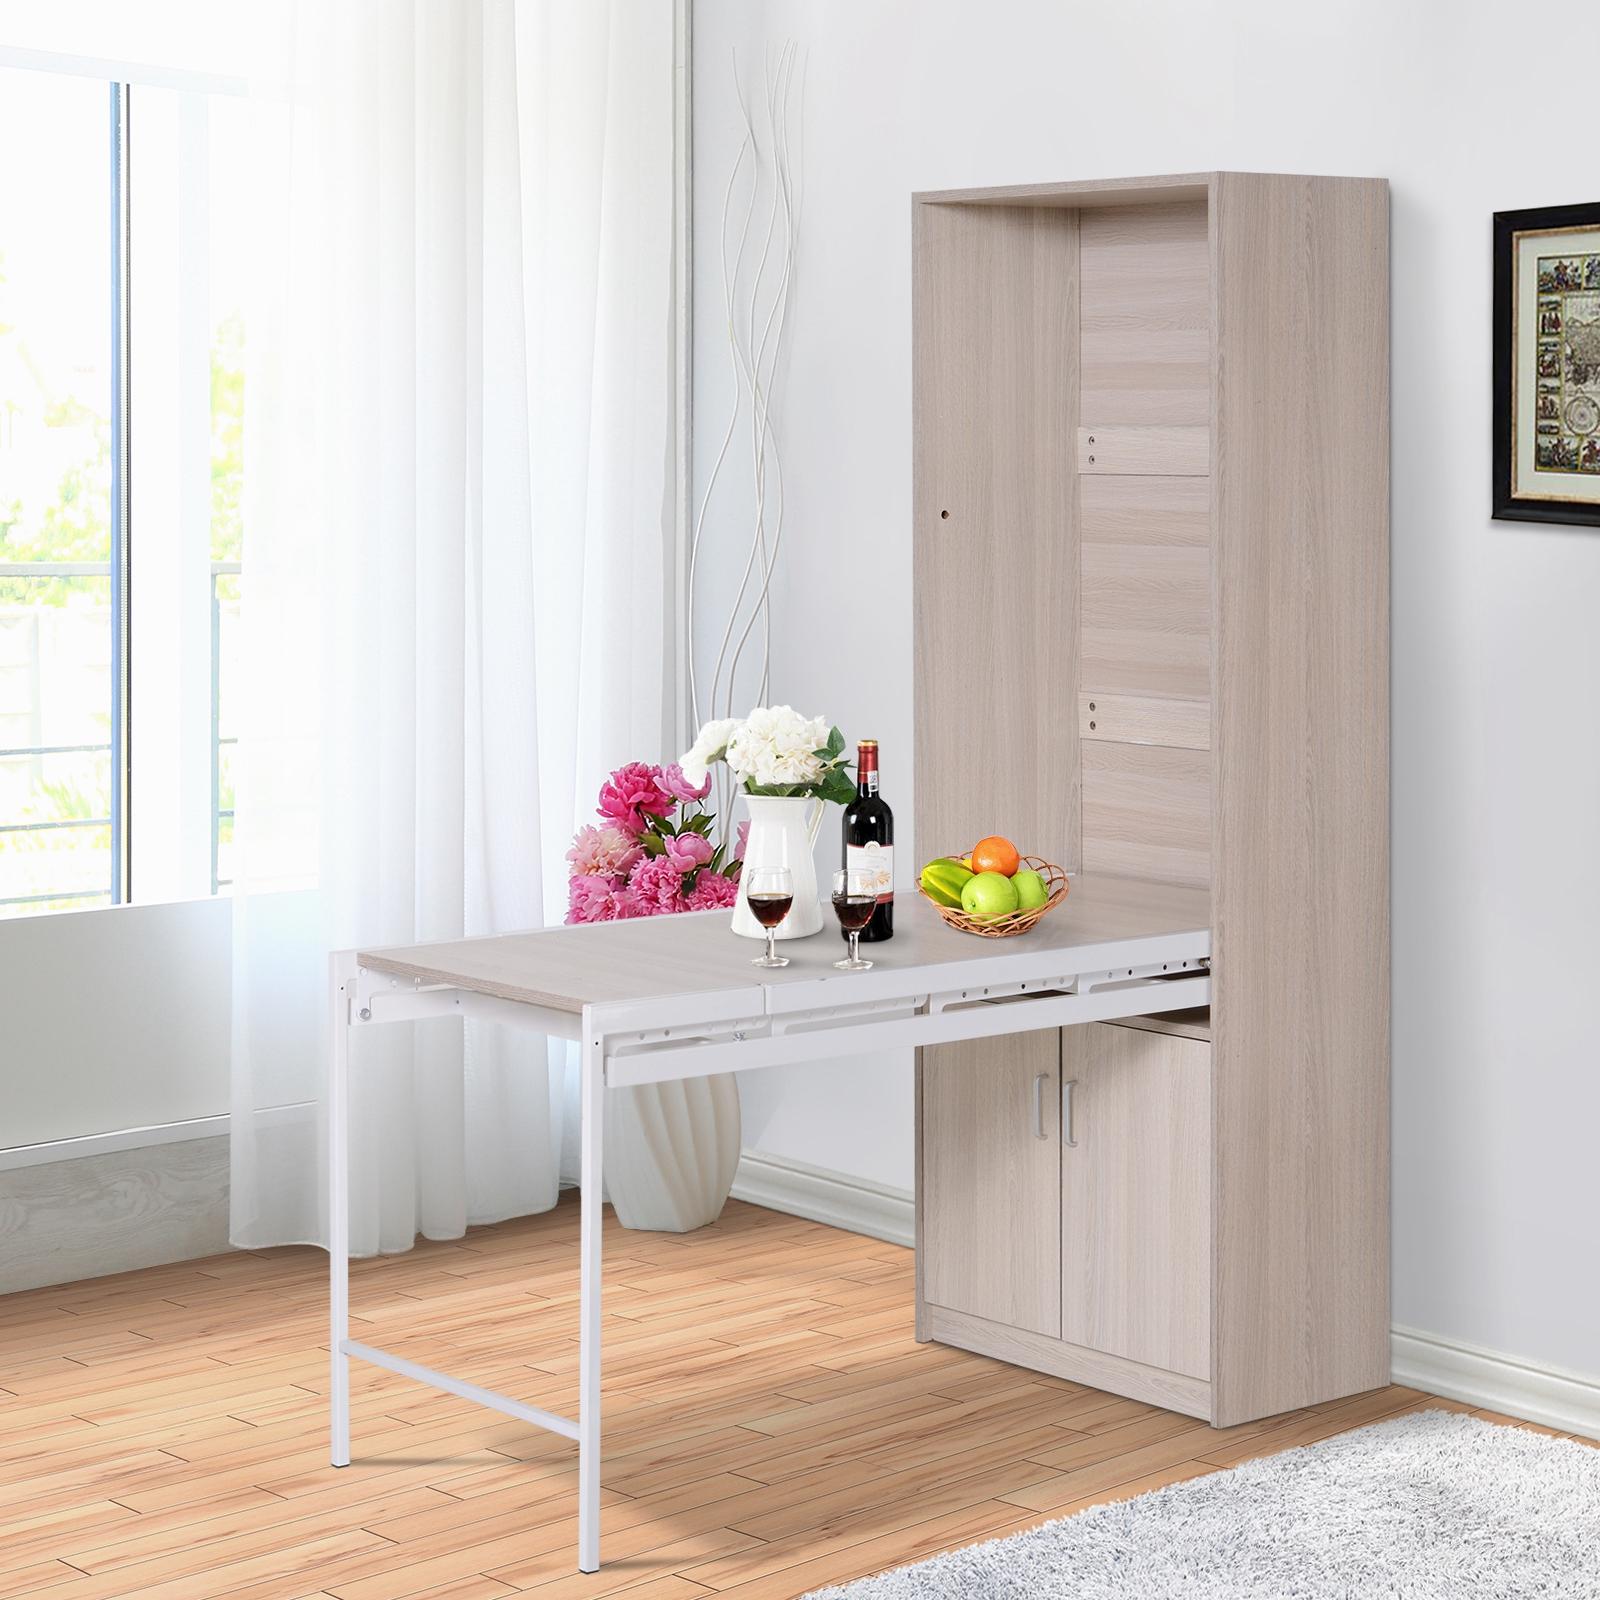 Homcom 2 In 1 Storage Bookcase W Drop Leaf Table Freestanding Oak Wood Color Ebay